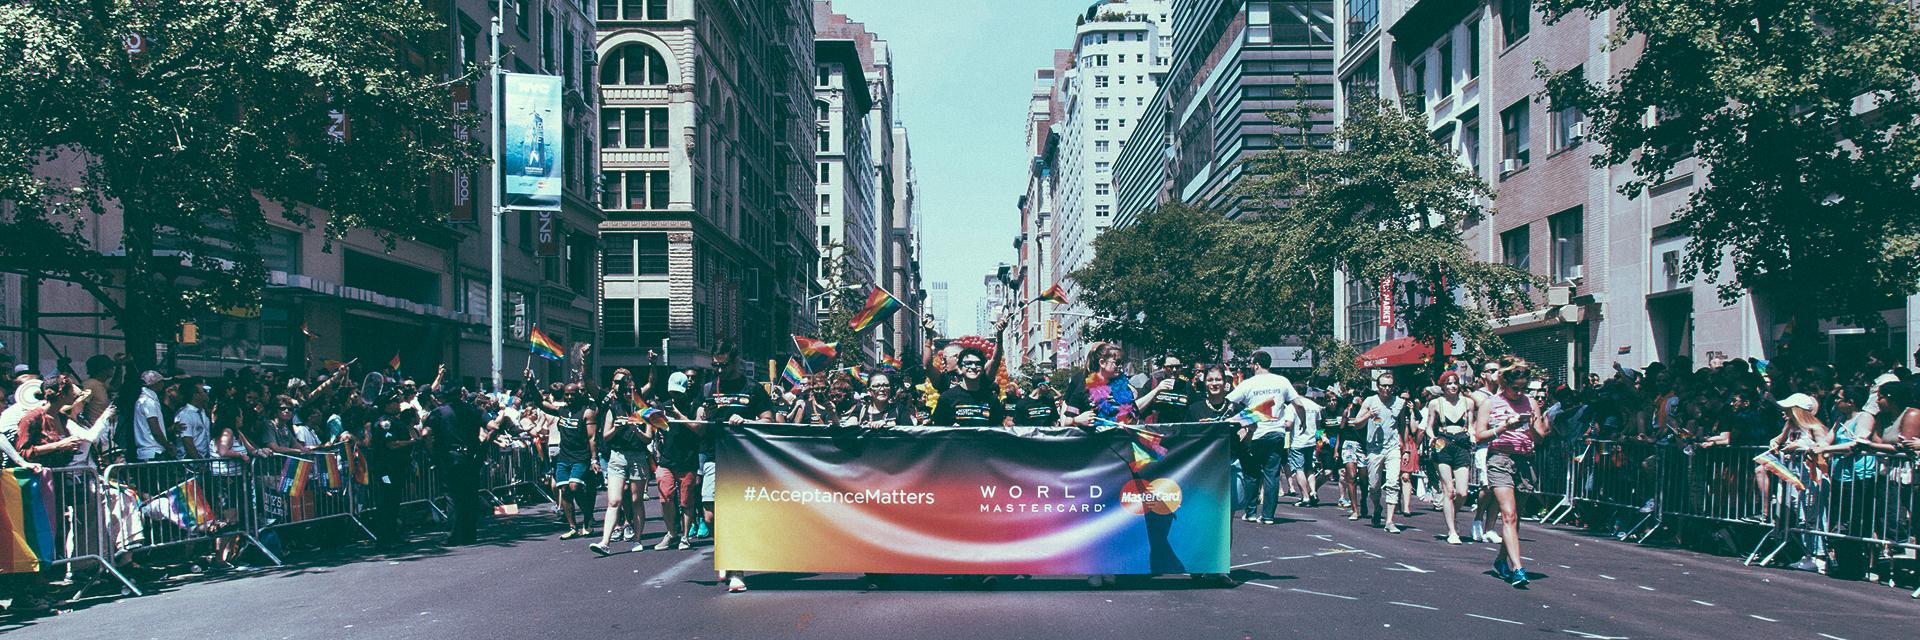 MasterCard NYC Pride Parade - John Ozbay